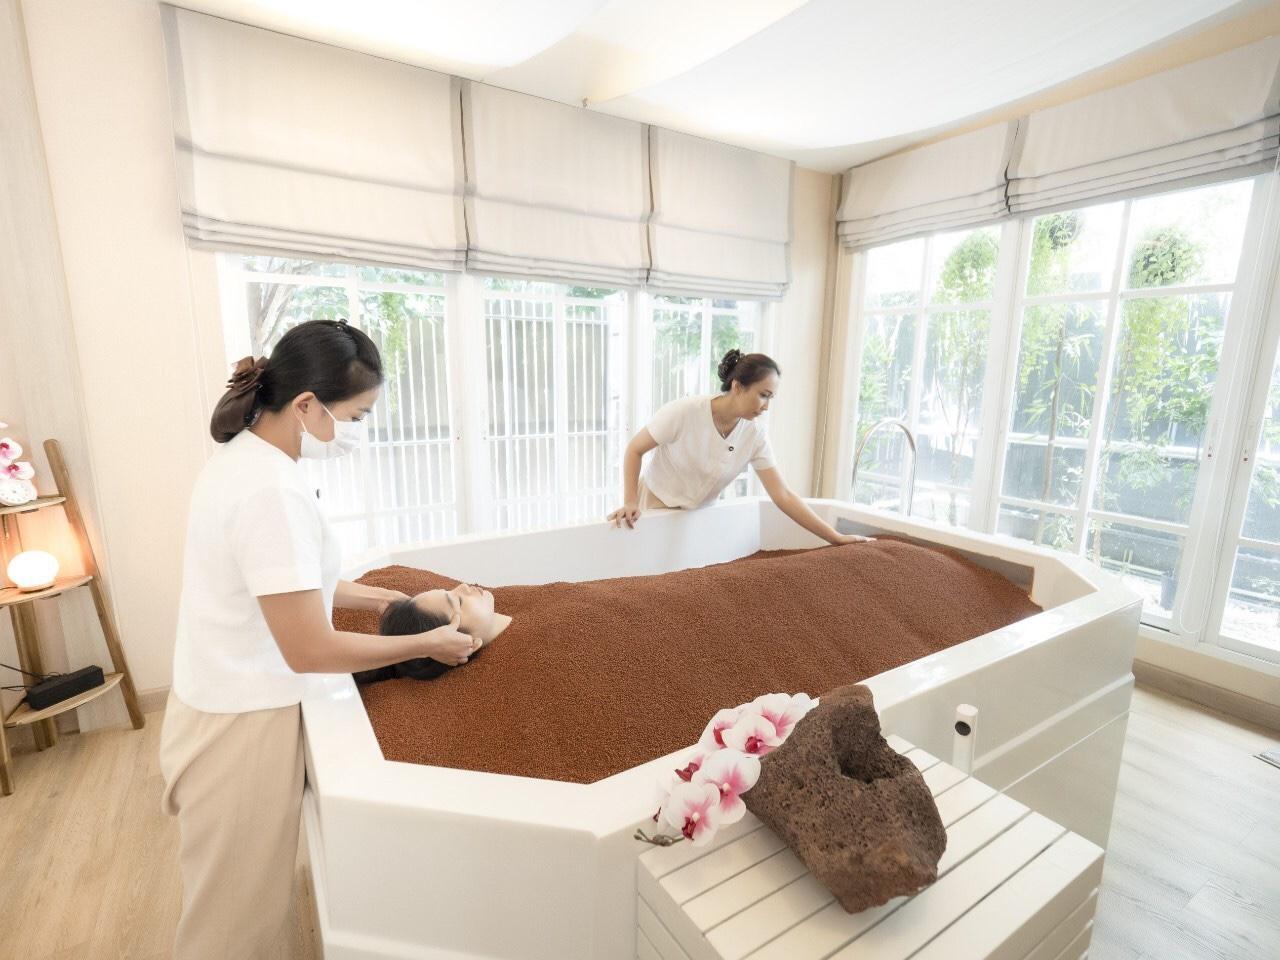 salon and spa insurance